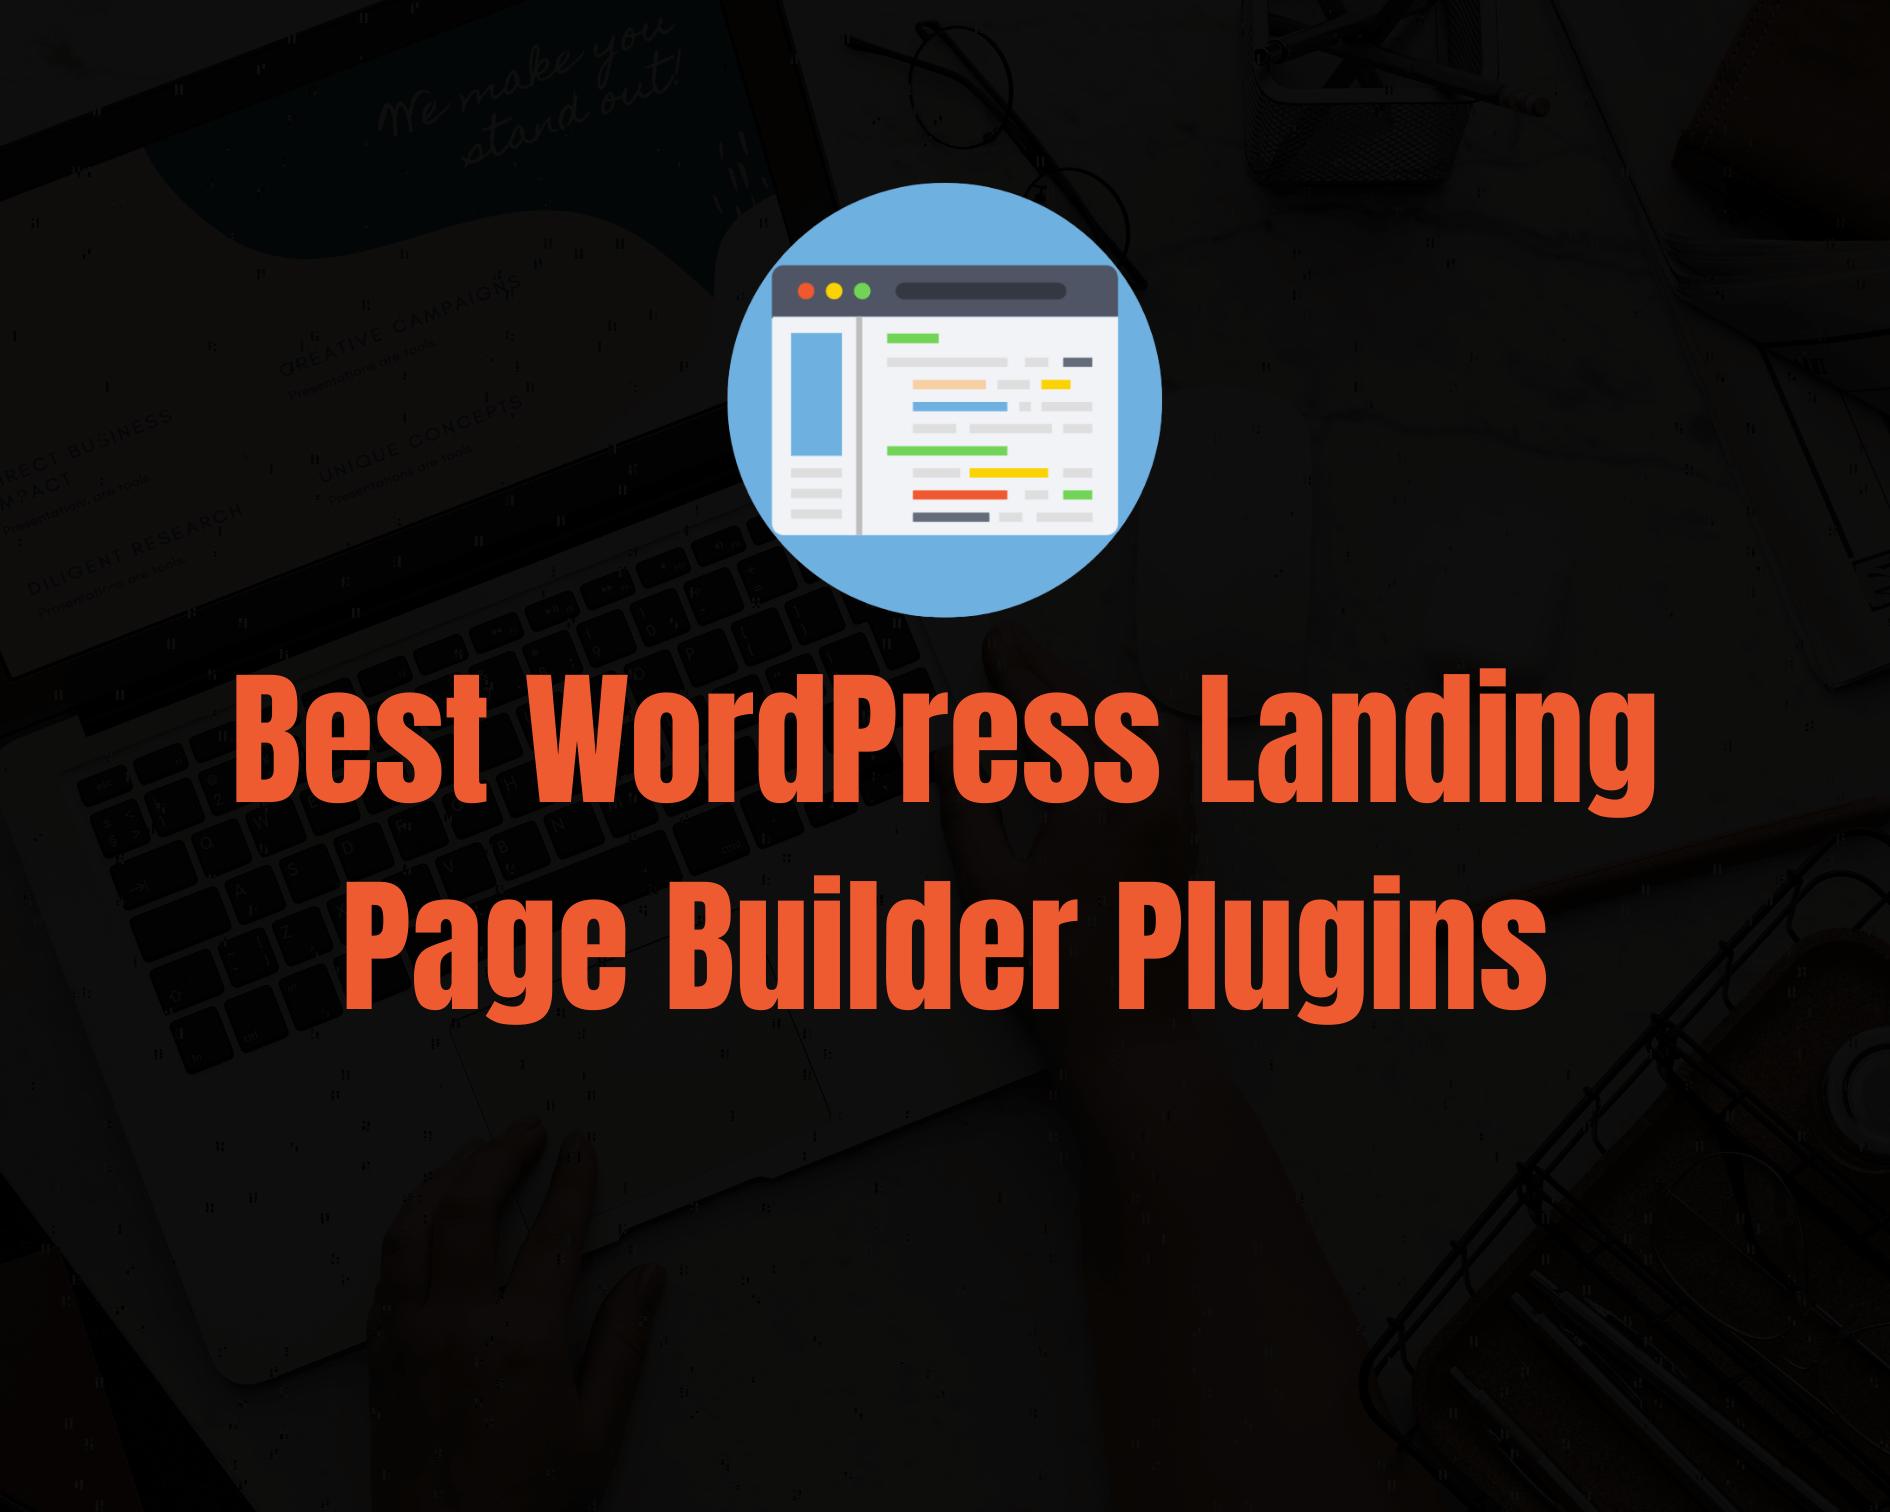 7 Best WordPress Landing Page Builder Plugins for 2020